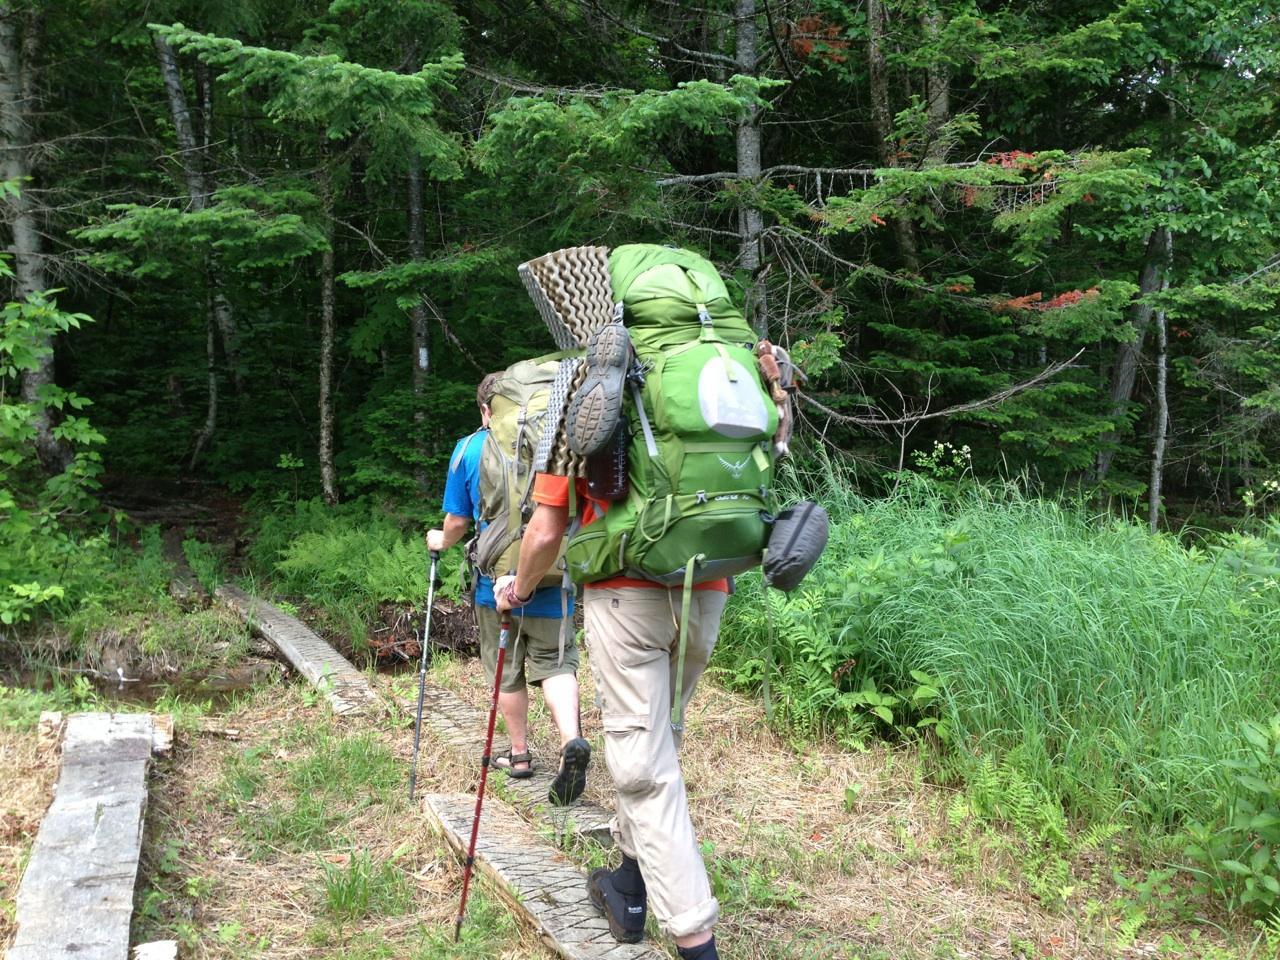 hiking away